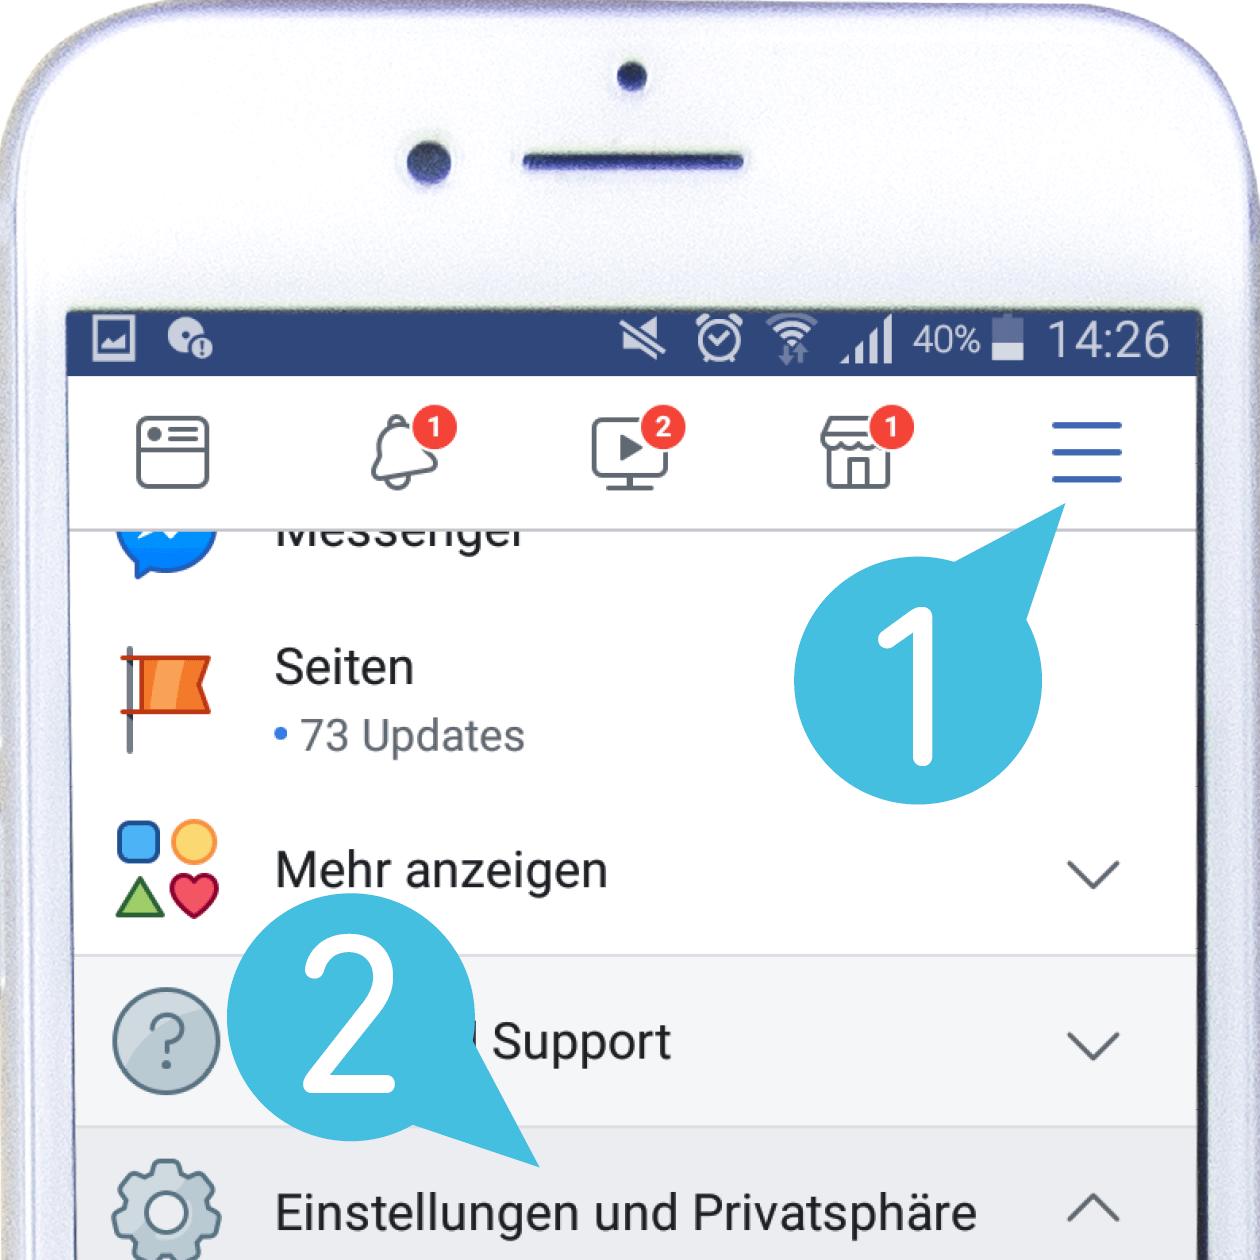 Tipps für Social Media, Facebook Priorisieren